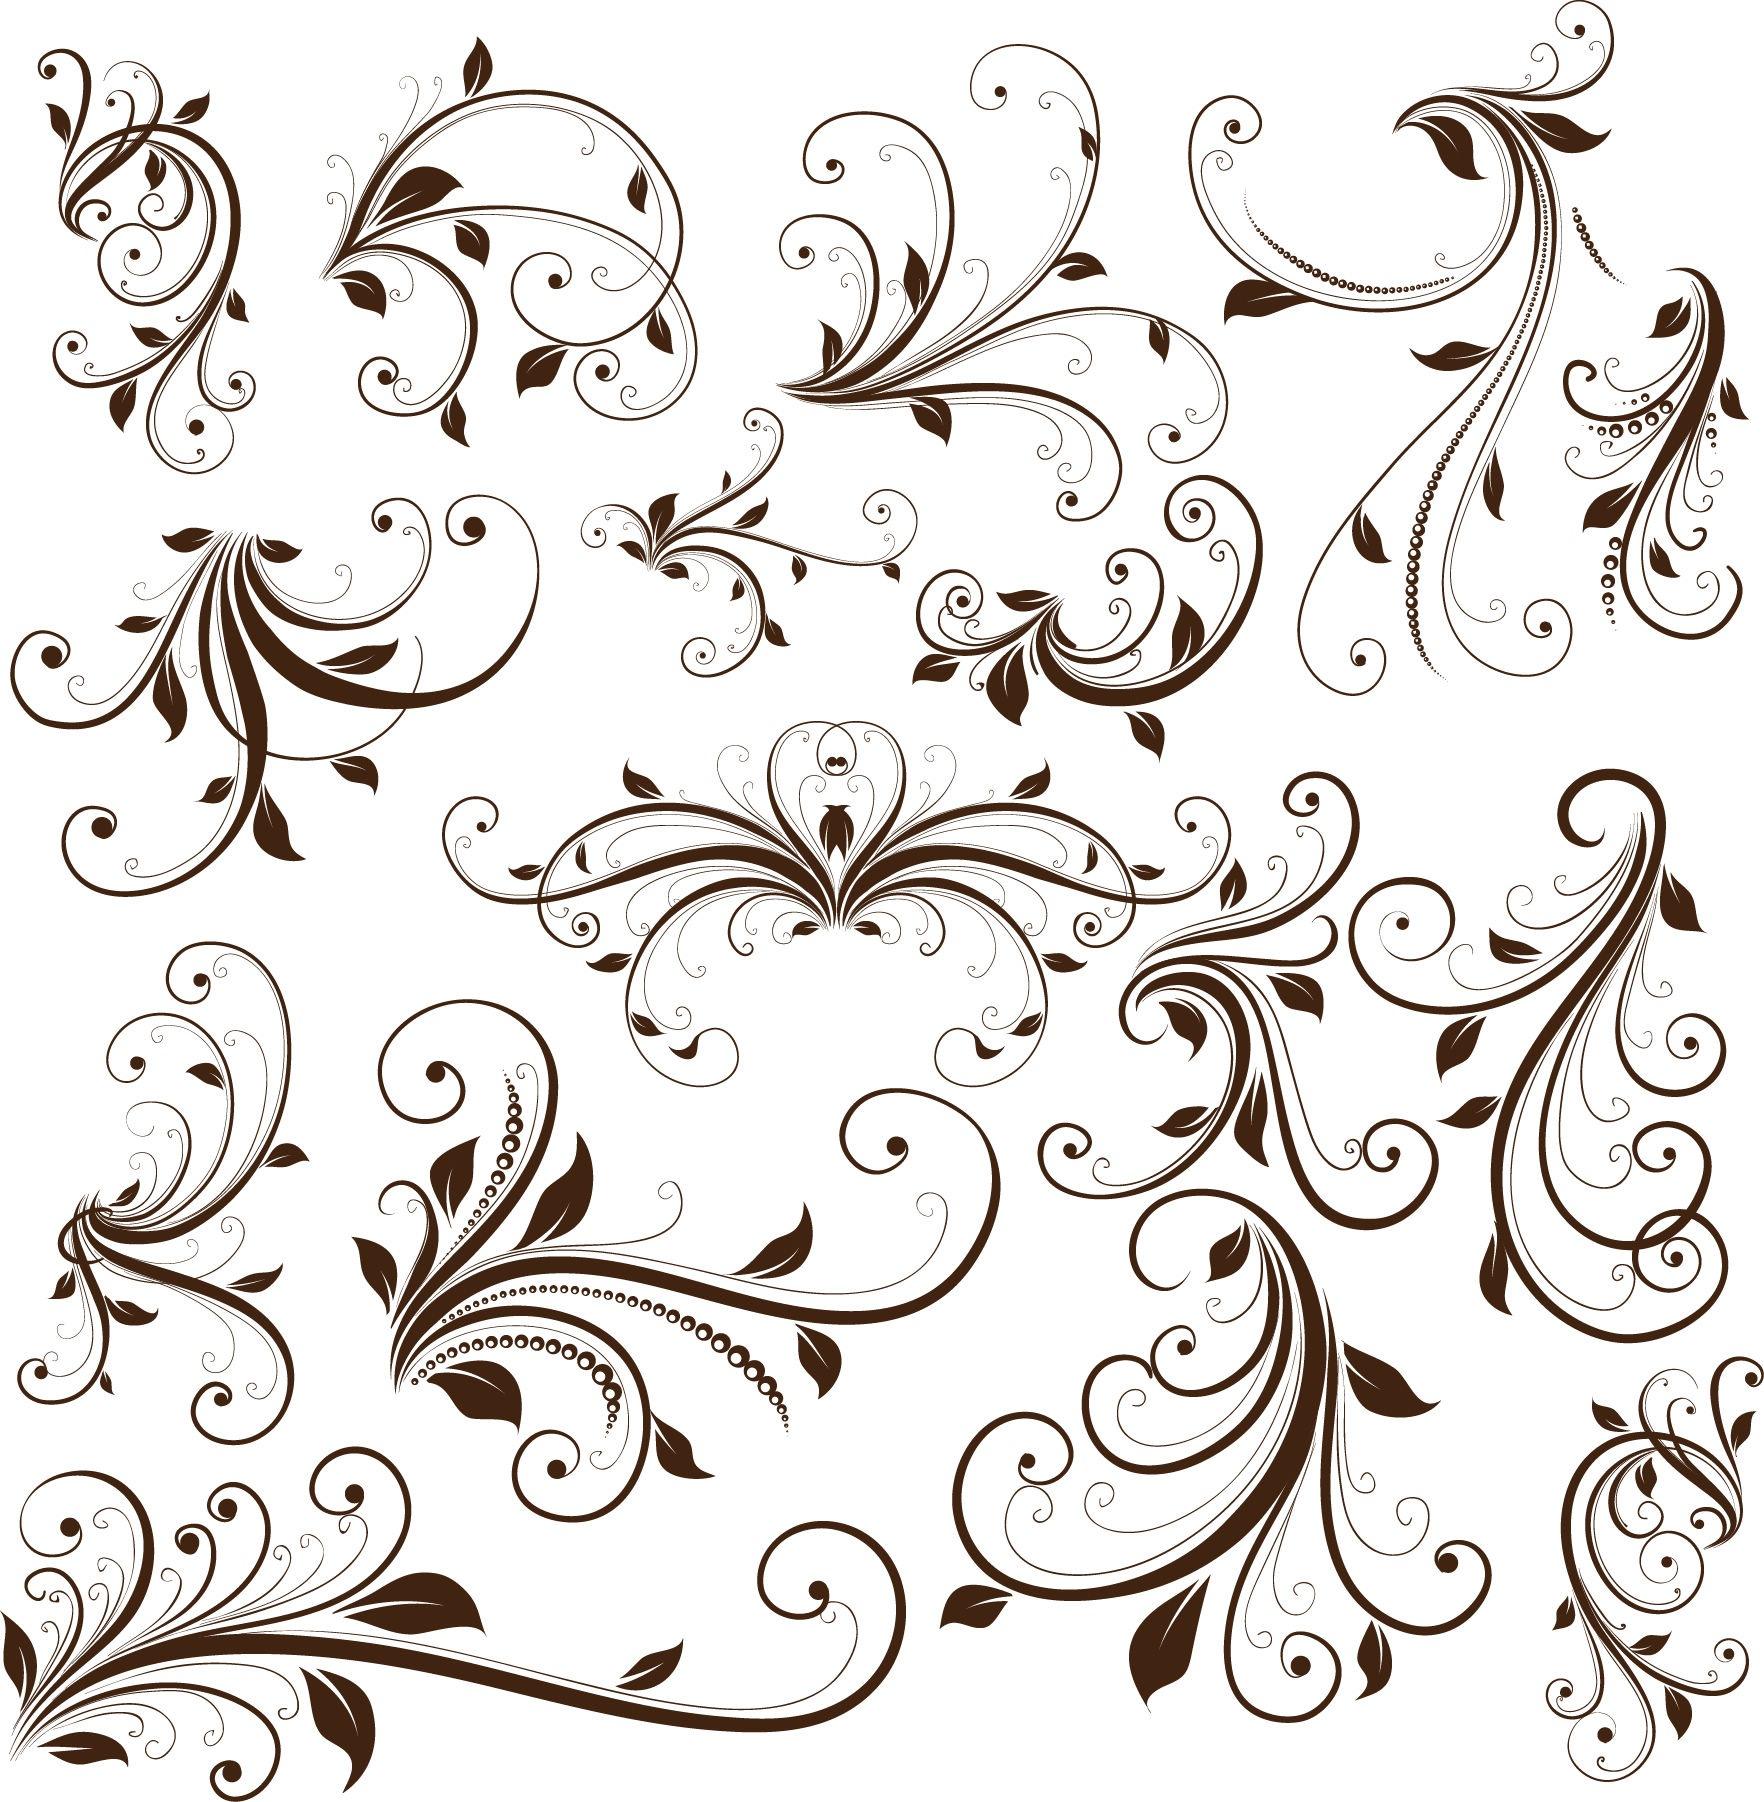 Decorative Swirl Vector Graphics